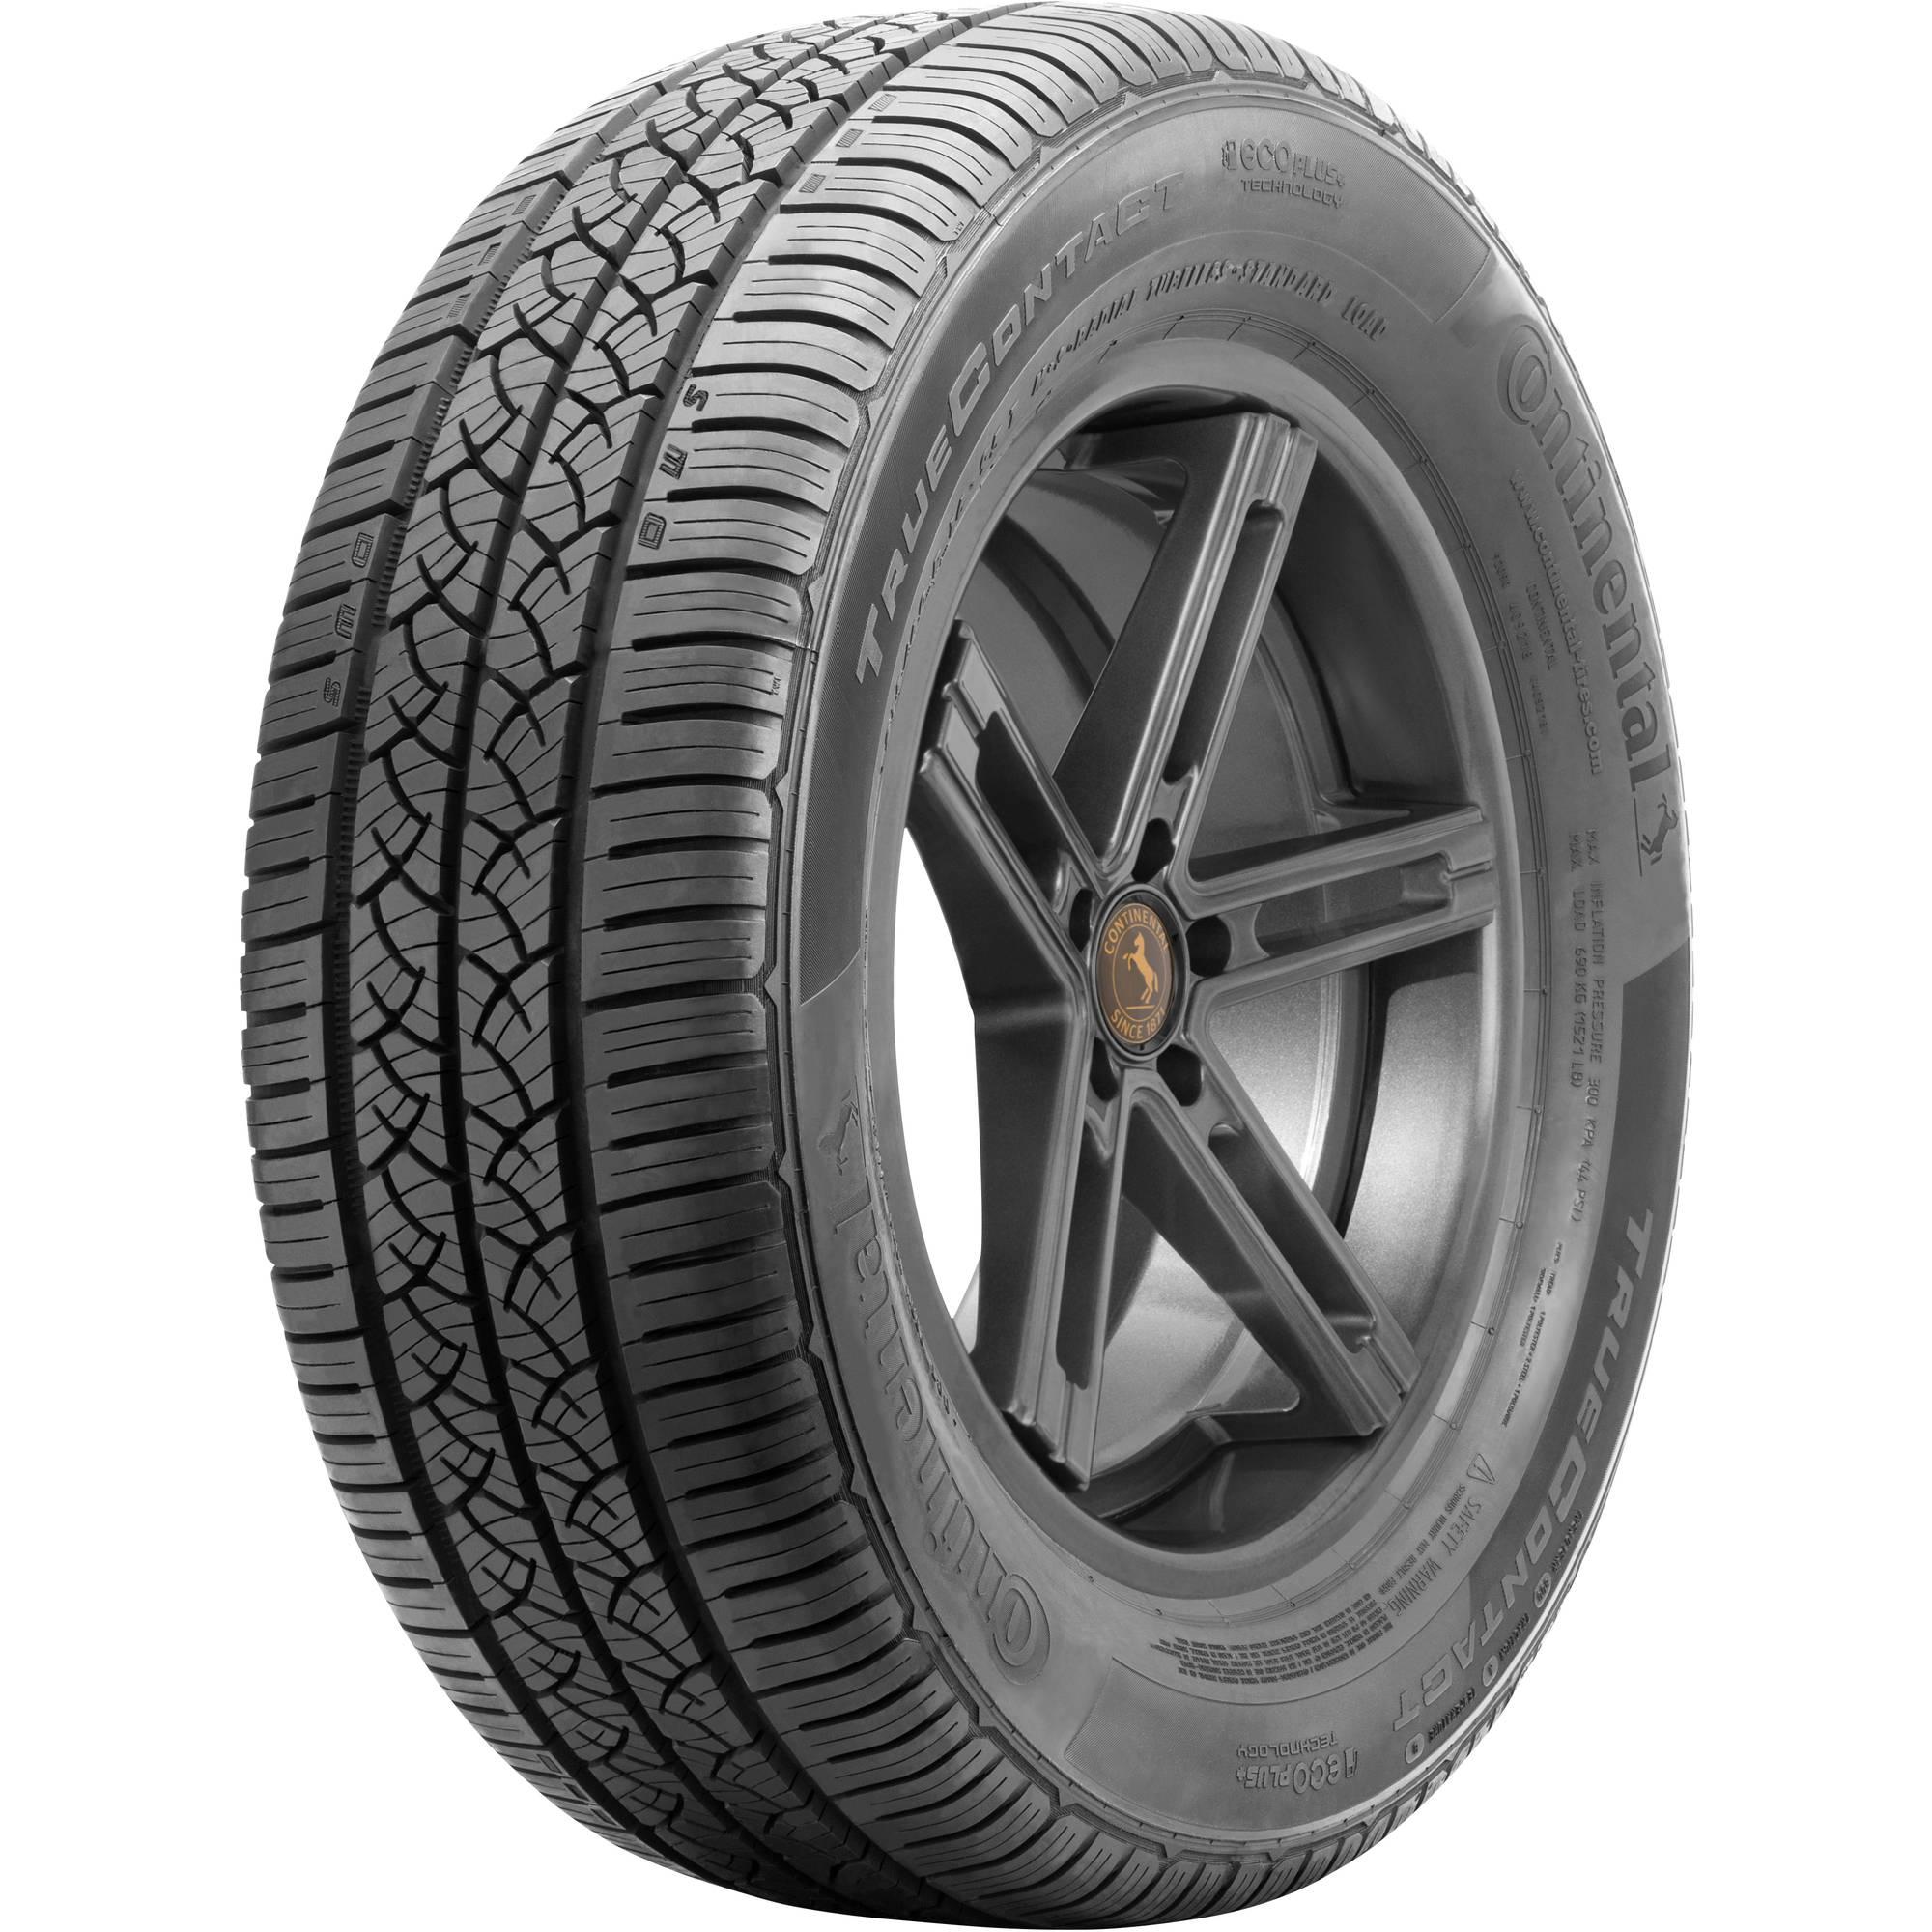 Continental Truecontact Tire 215/65R16 Tire 98T